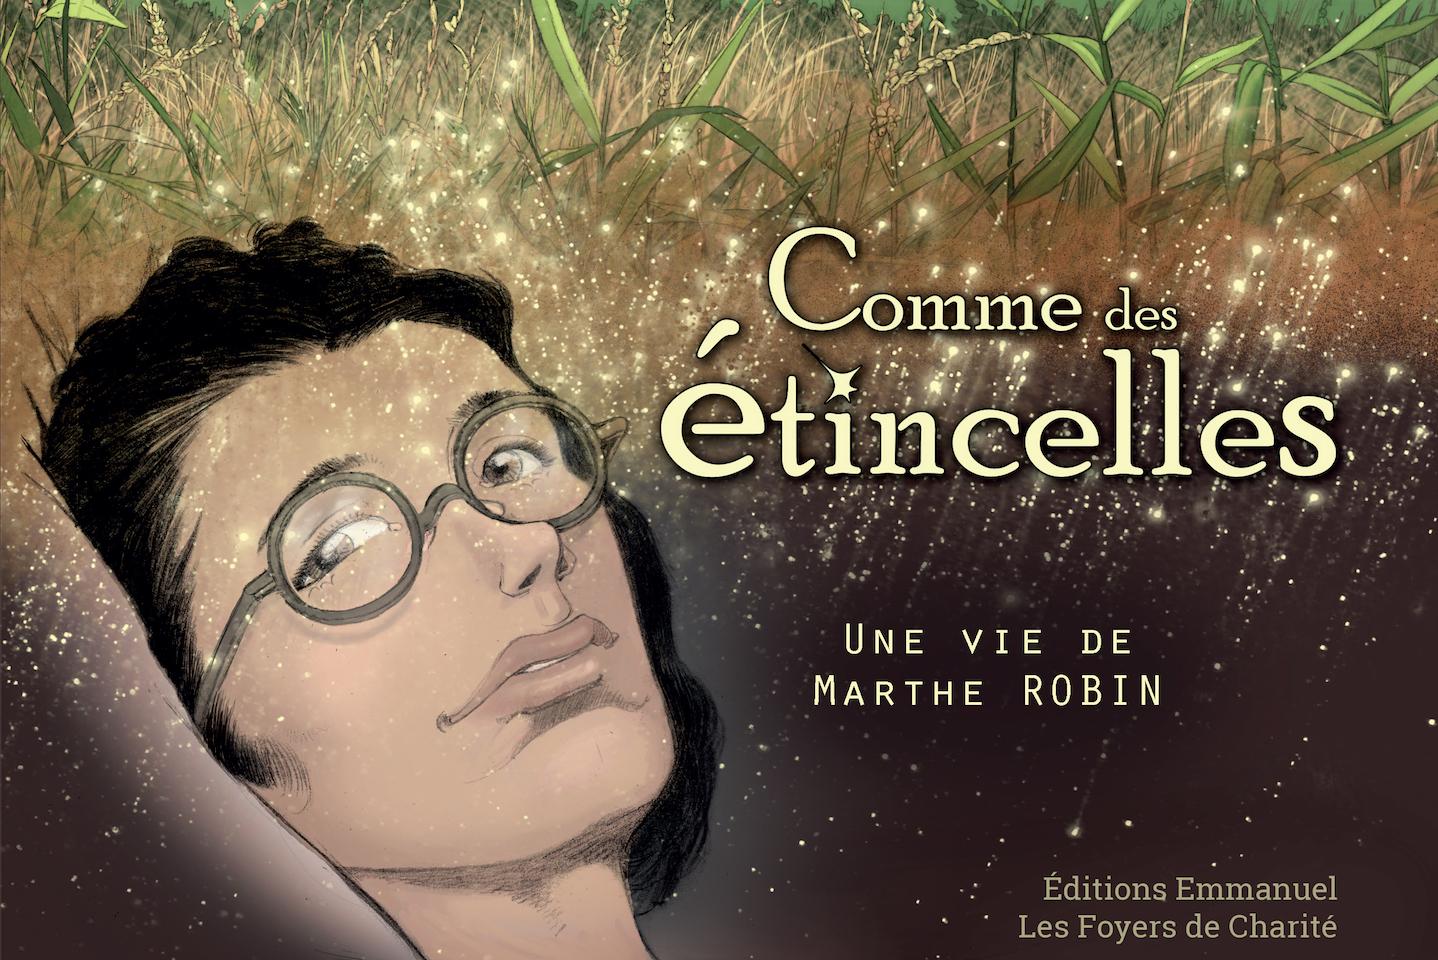 La vie de Marthe Robin en bande dessinée. © Éditions de l'Emmanuel